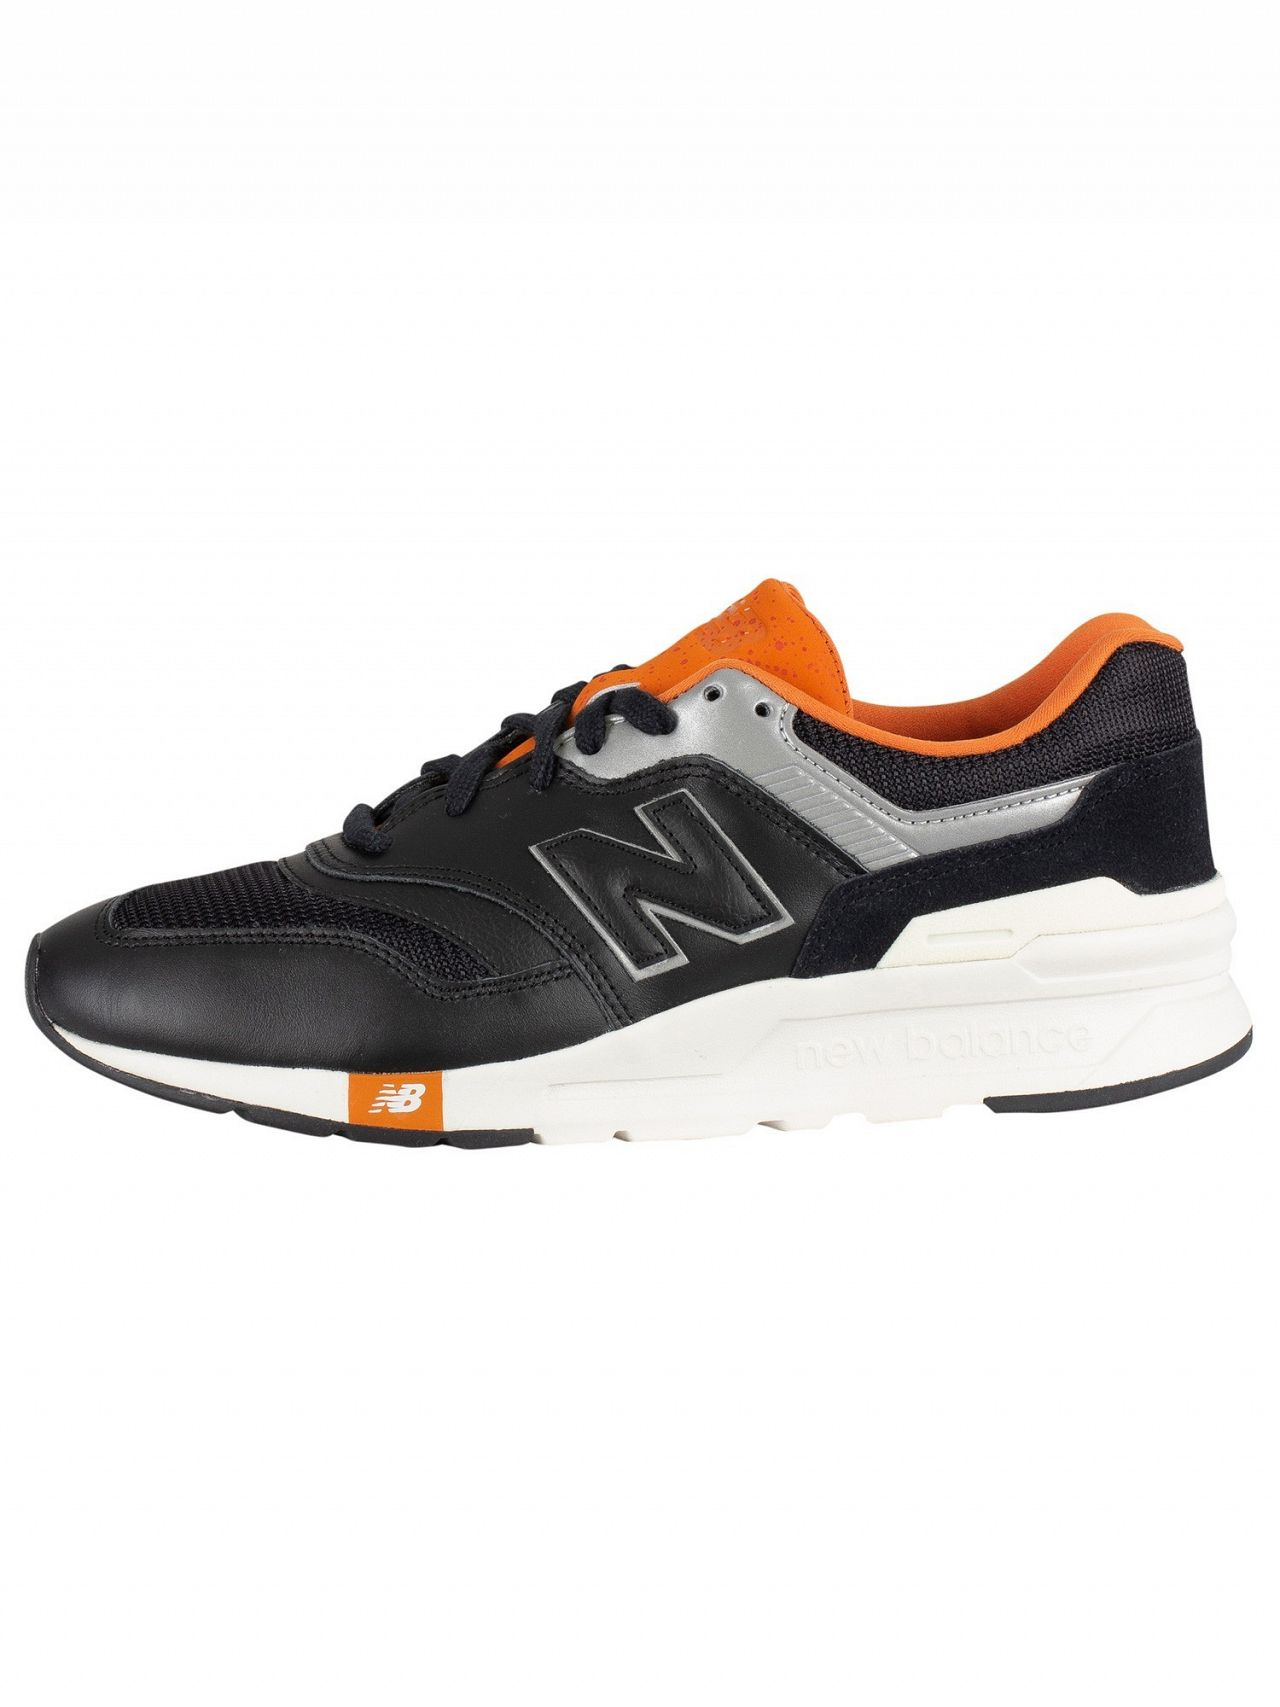 new balance 997h black orange